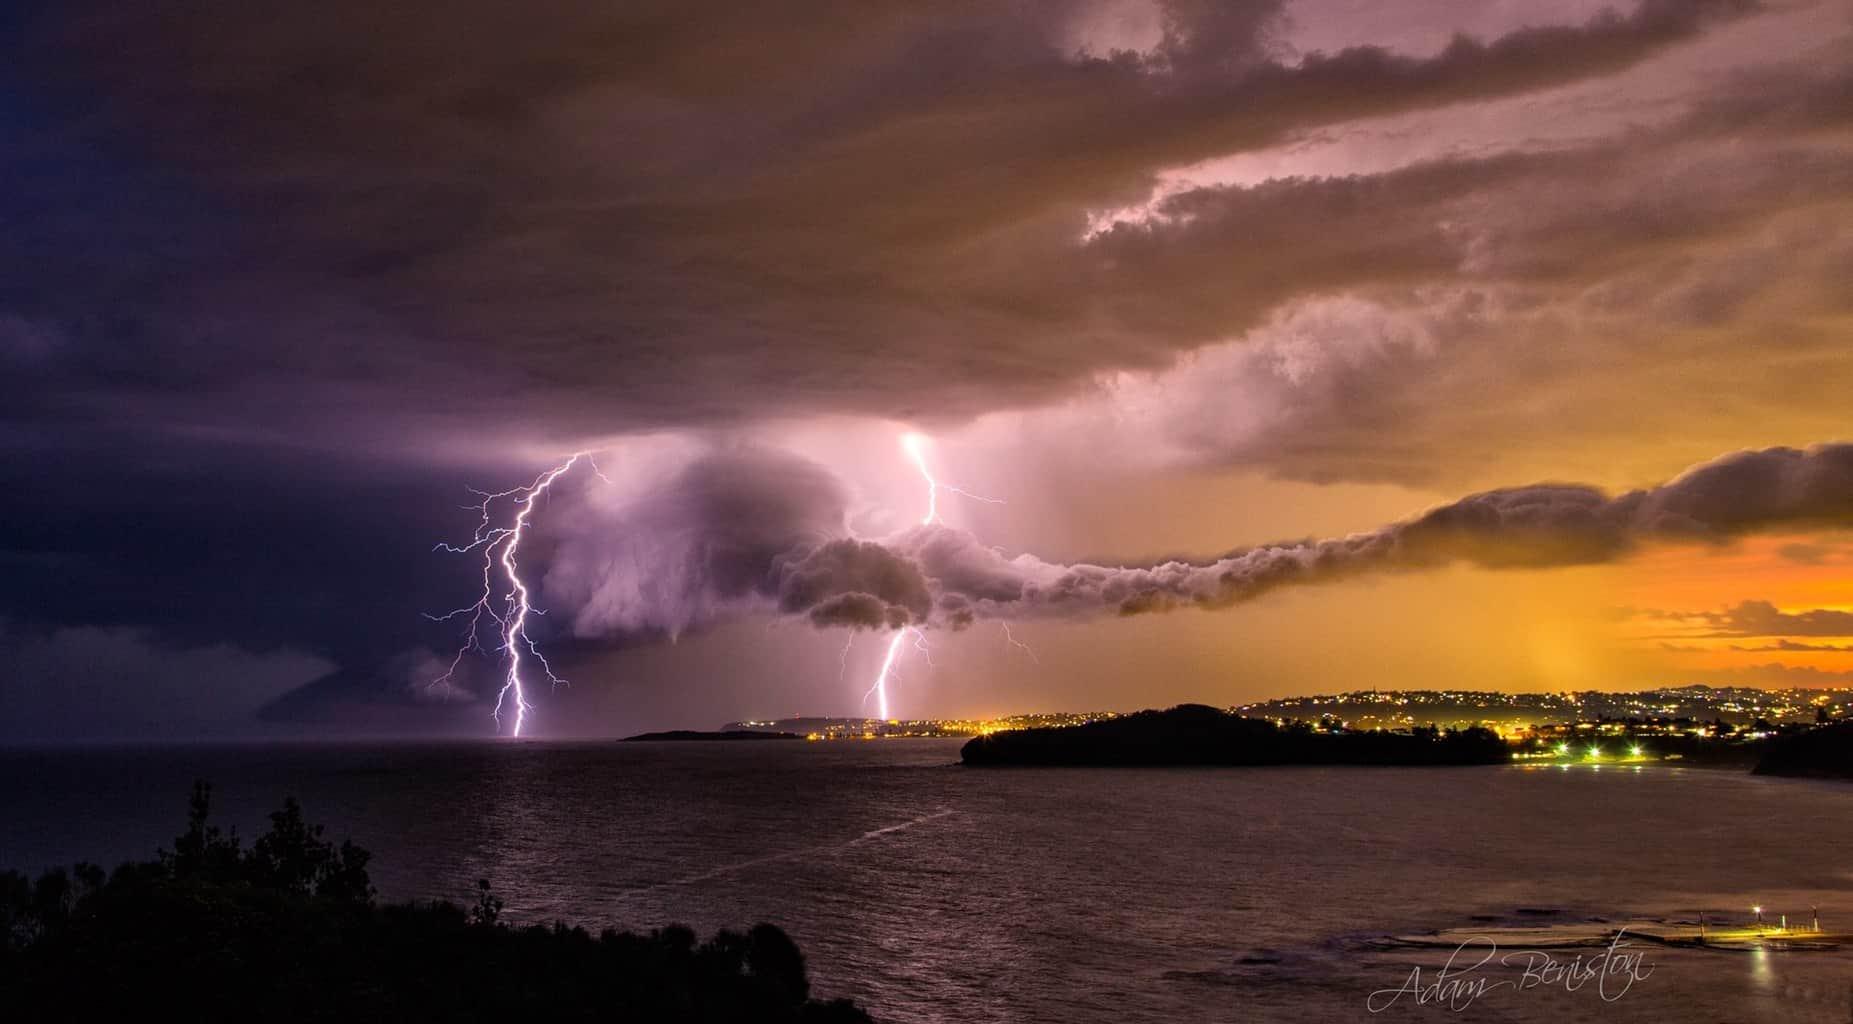 Storm came through Sydney last night right on Sunset.